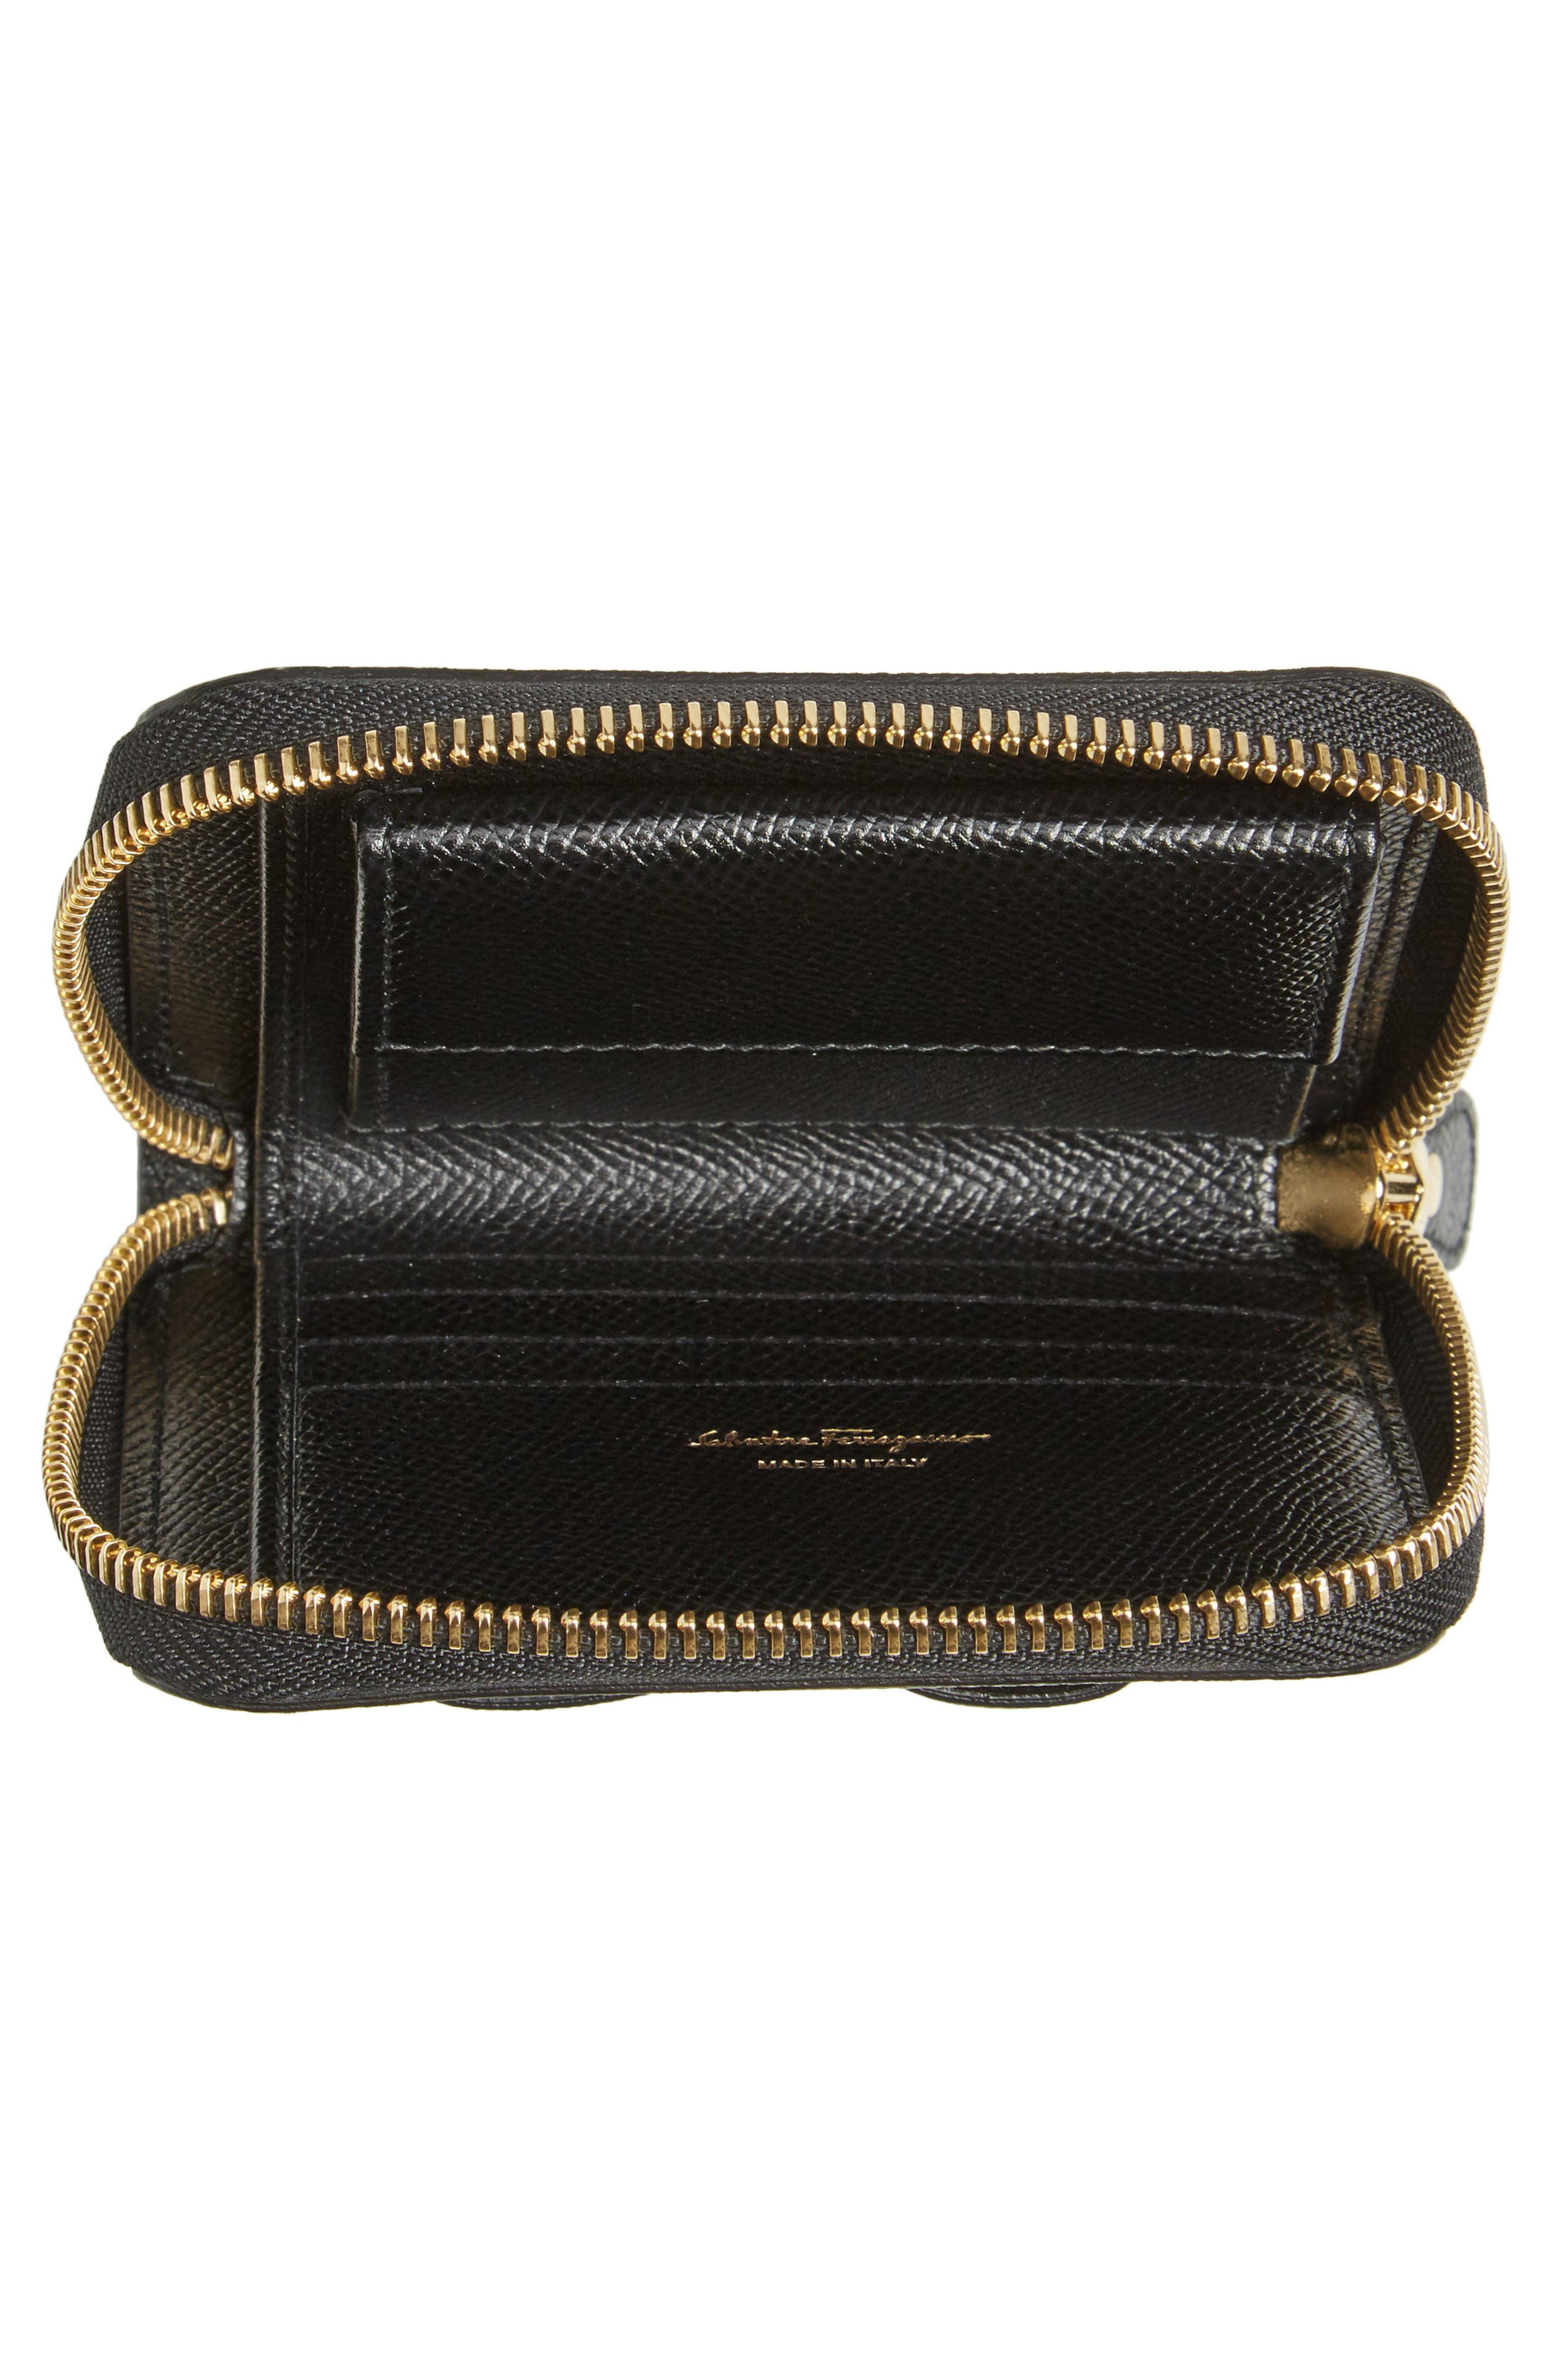 Vara Leather Zip Around French Wallet,                             Alternate thumbnail 2, color,                             NERO